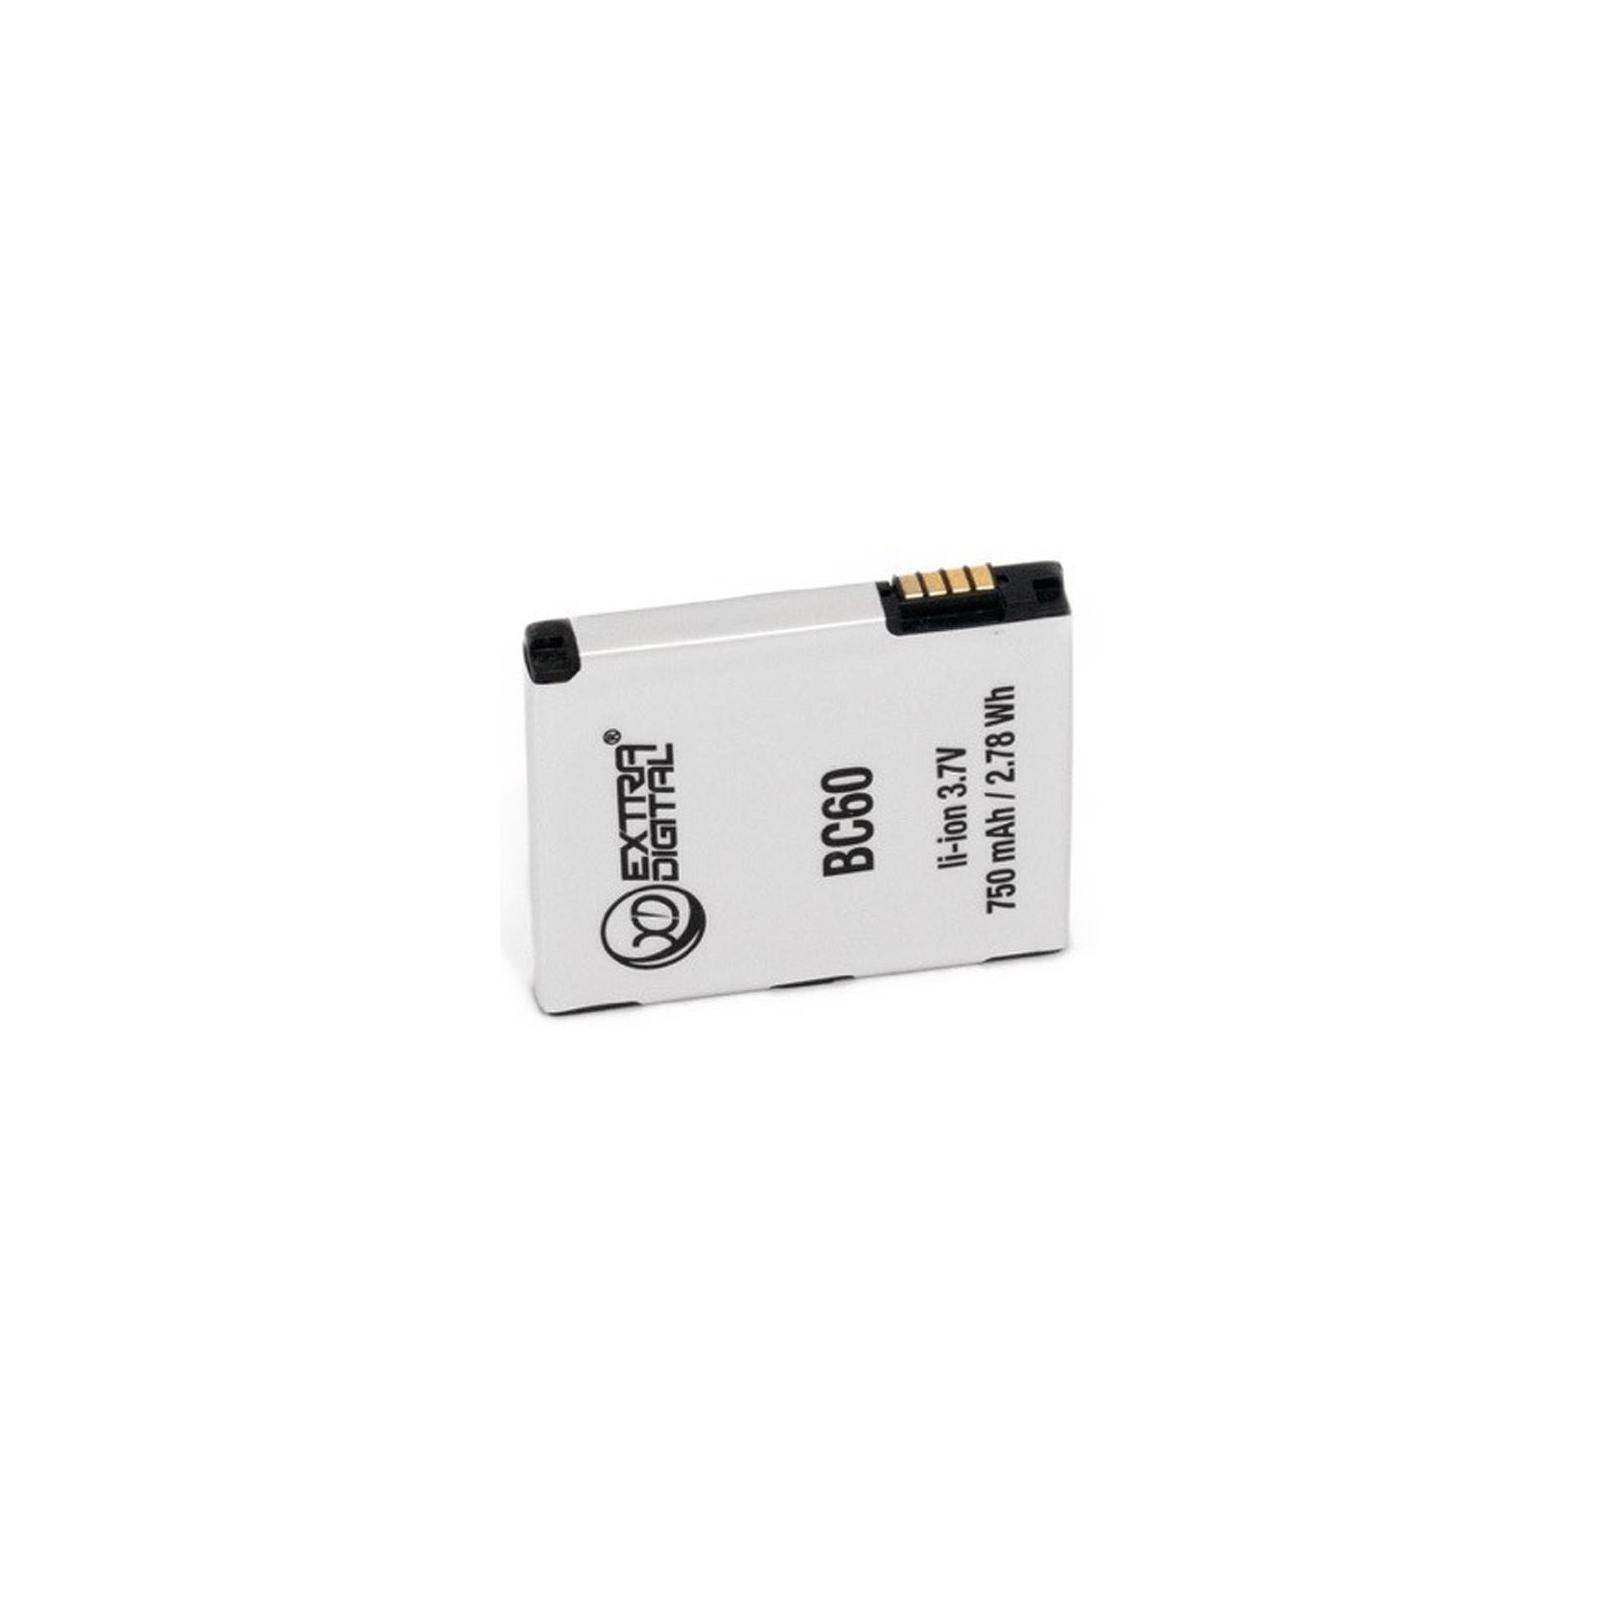 Аккумуляторная батарея EXTRADIGITAL Motorola BC60 (750 mAh) (BMM6253) изображение 3